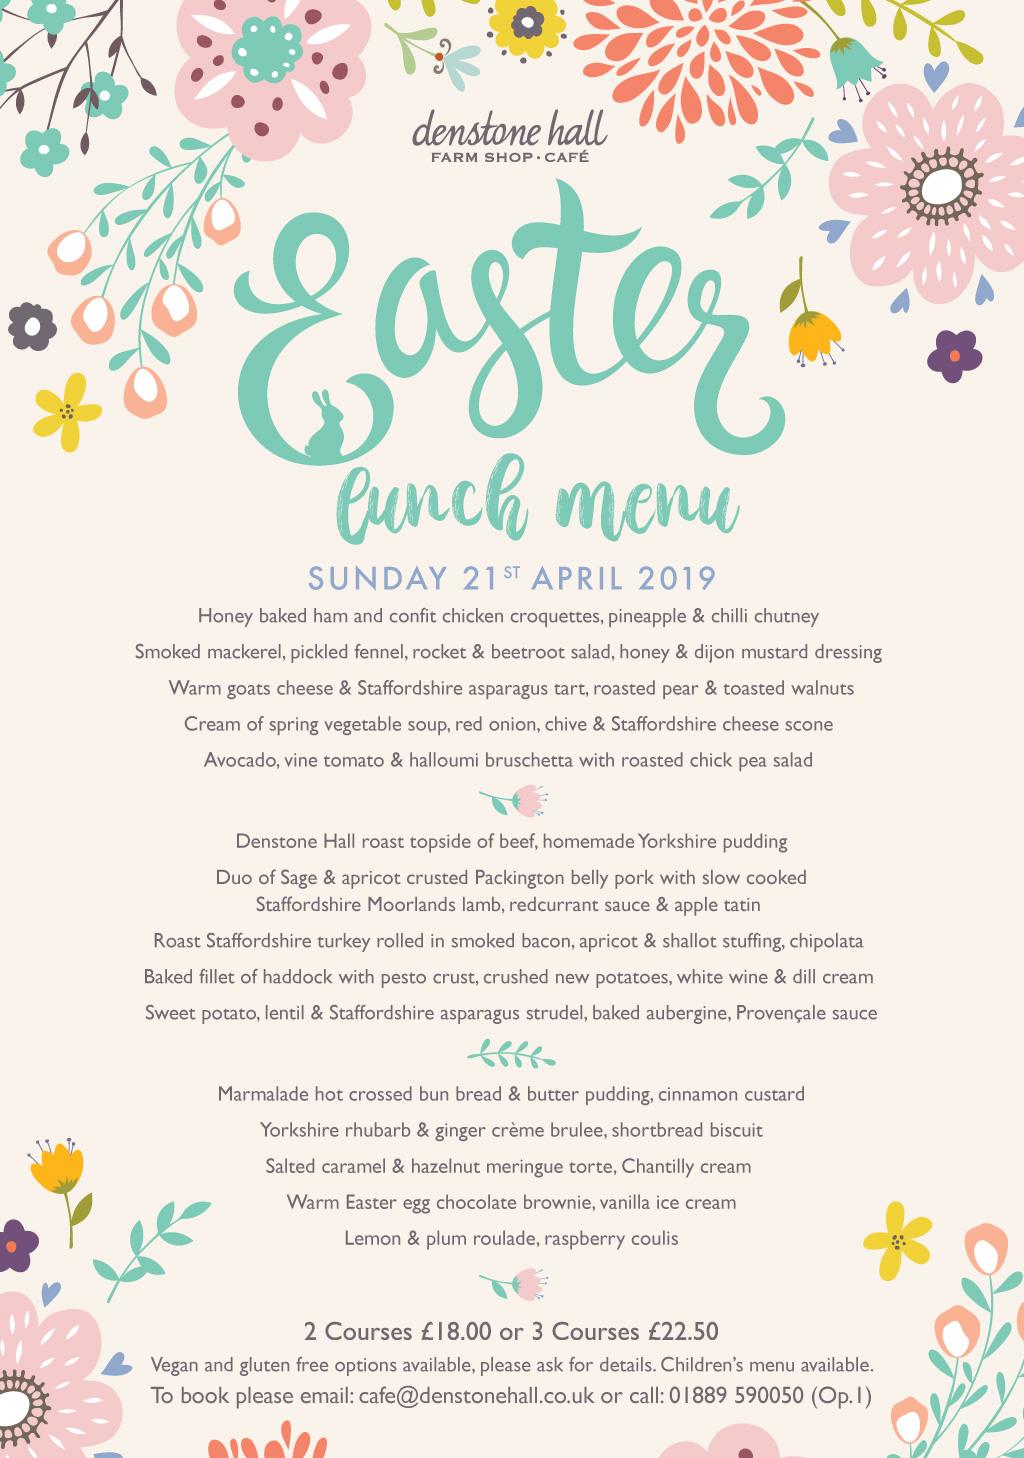 Easter Sunday Menu - Sunday 21st April